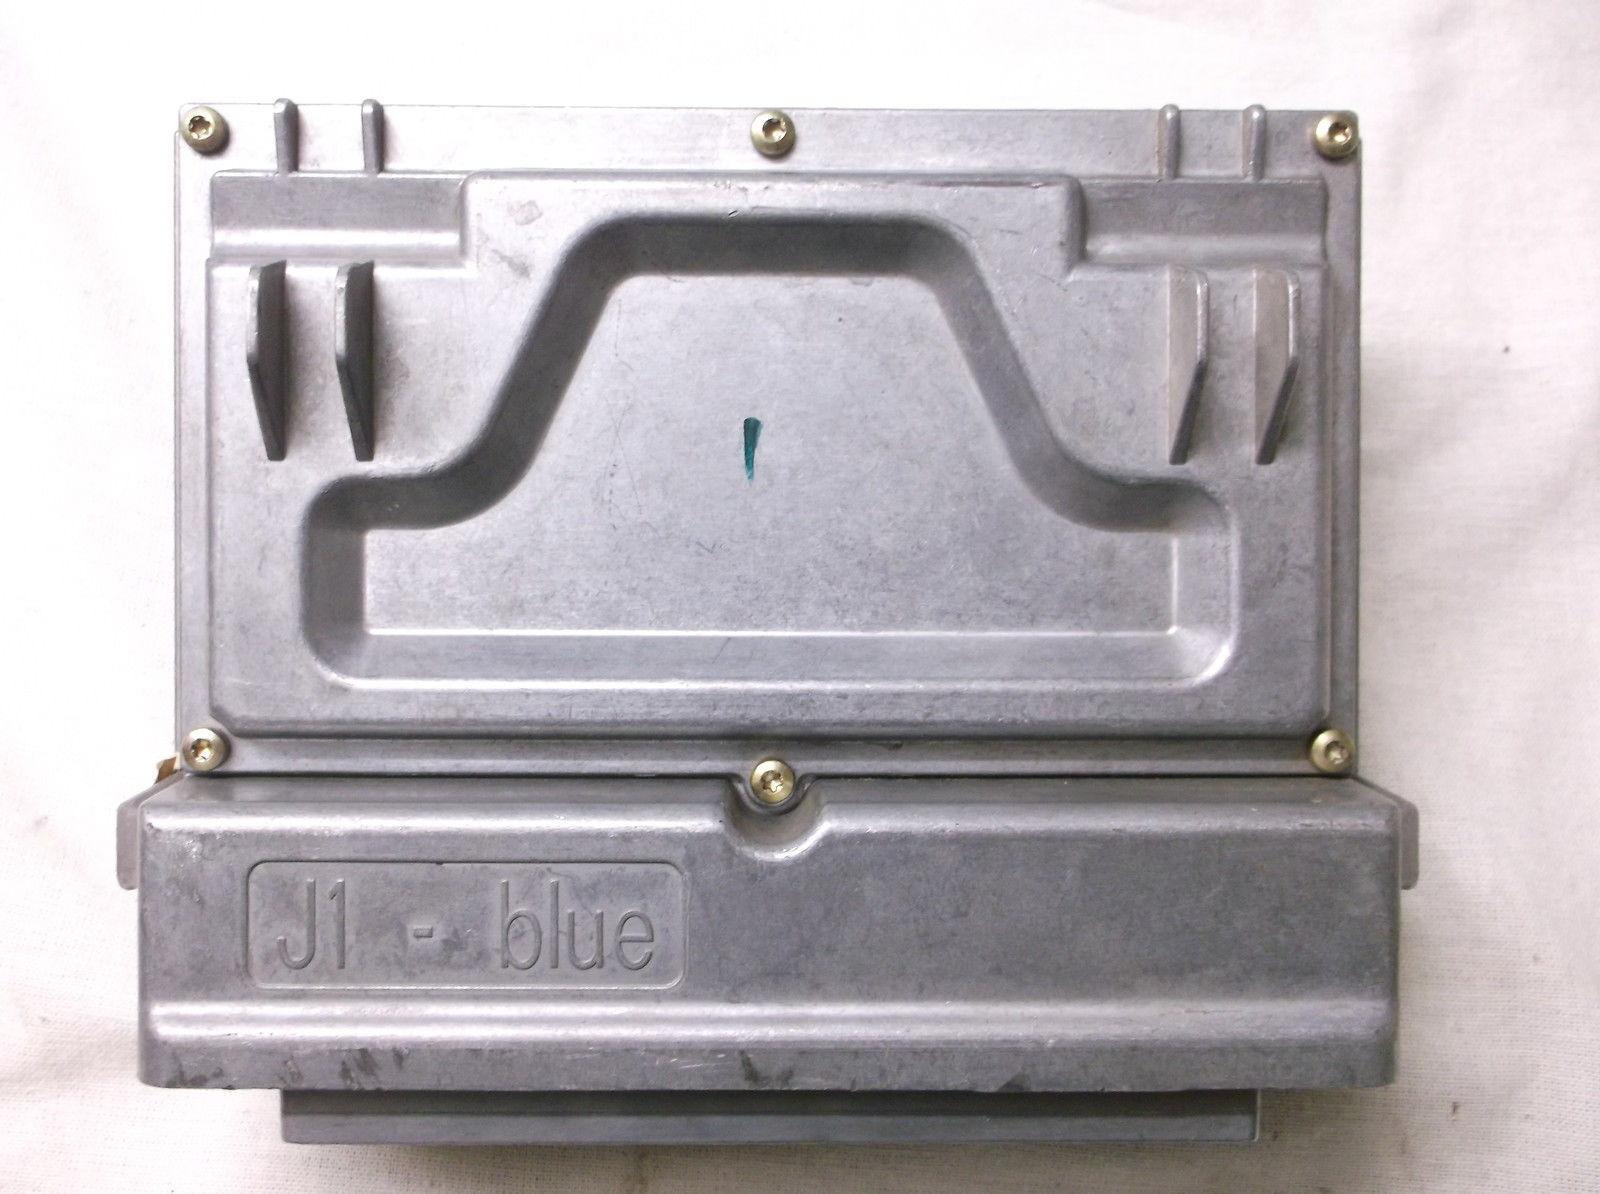 2005 Pontiac G6 Fuse Box Diagram 1999 Pontiac Bonneville Blower Motor